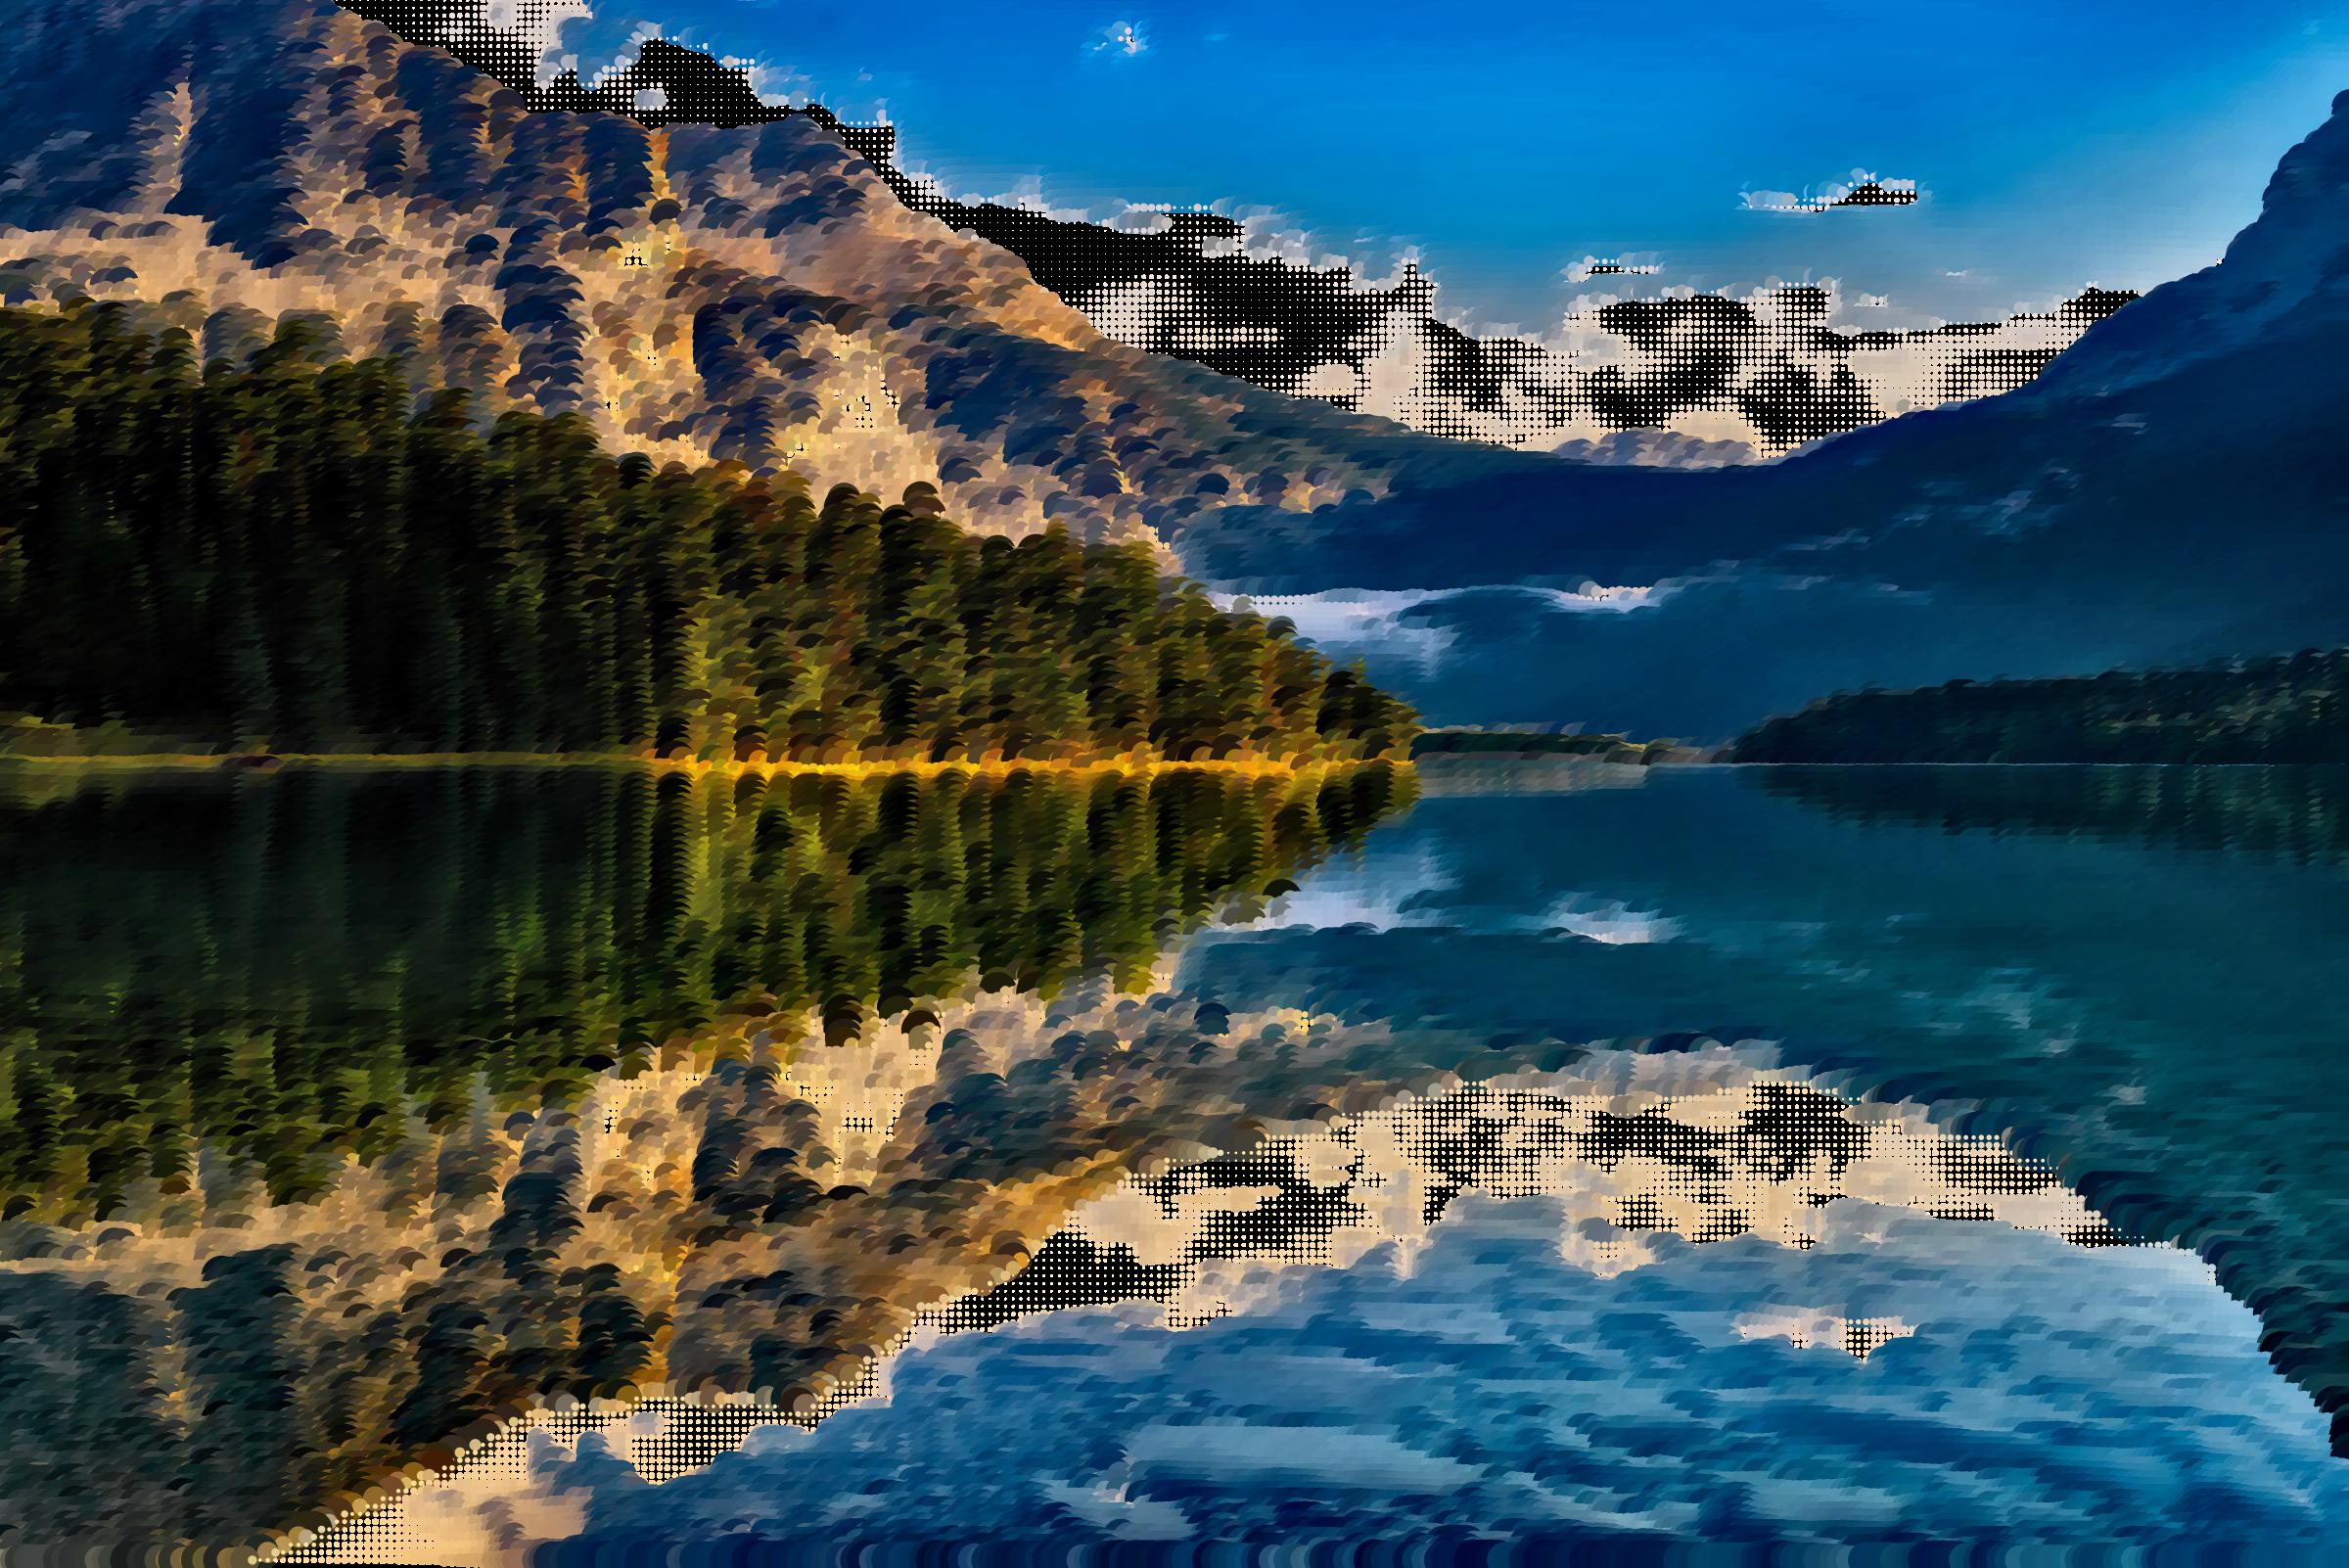 Surreal canadian big image. Water clipart lake